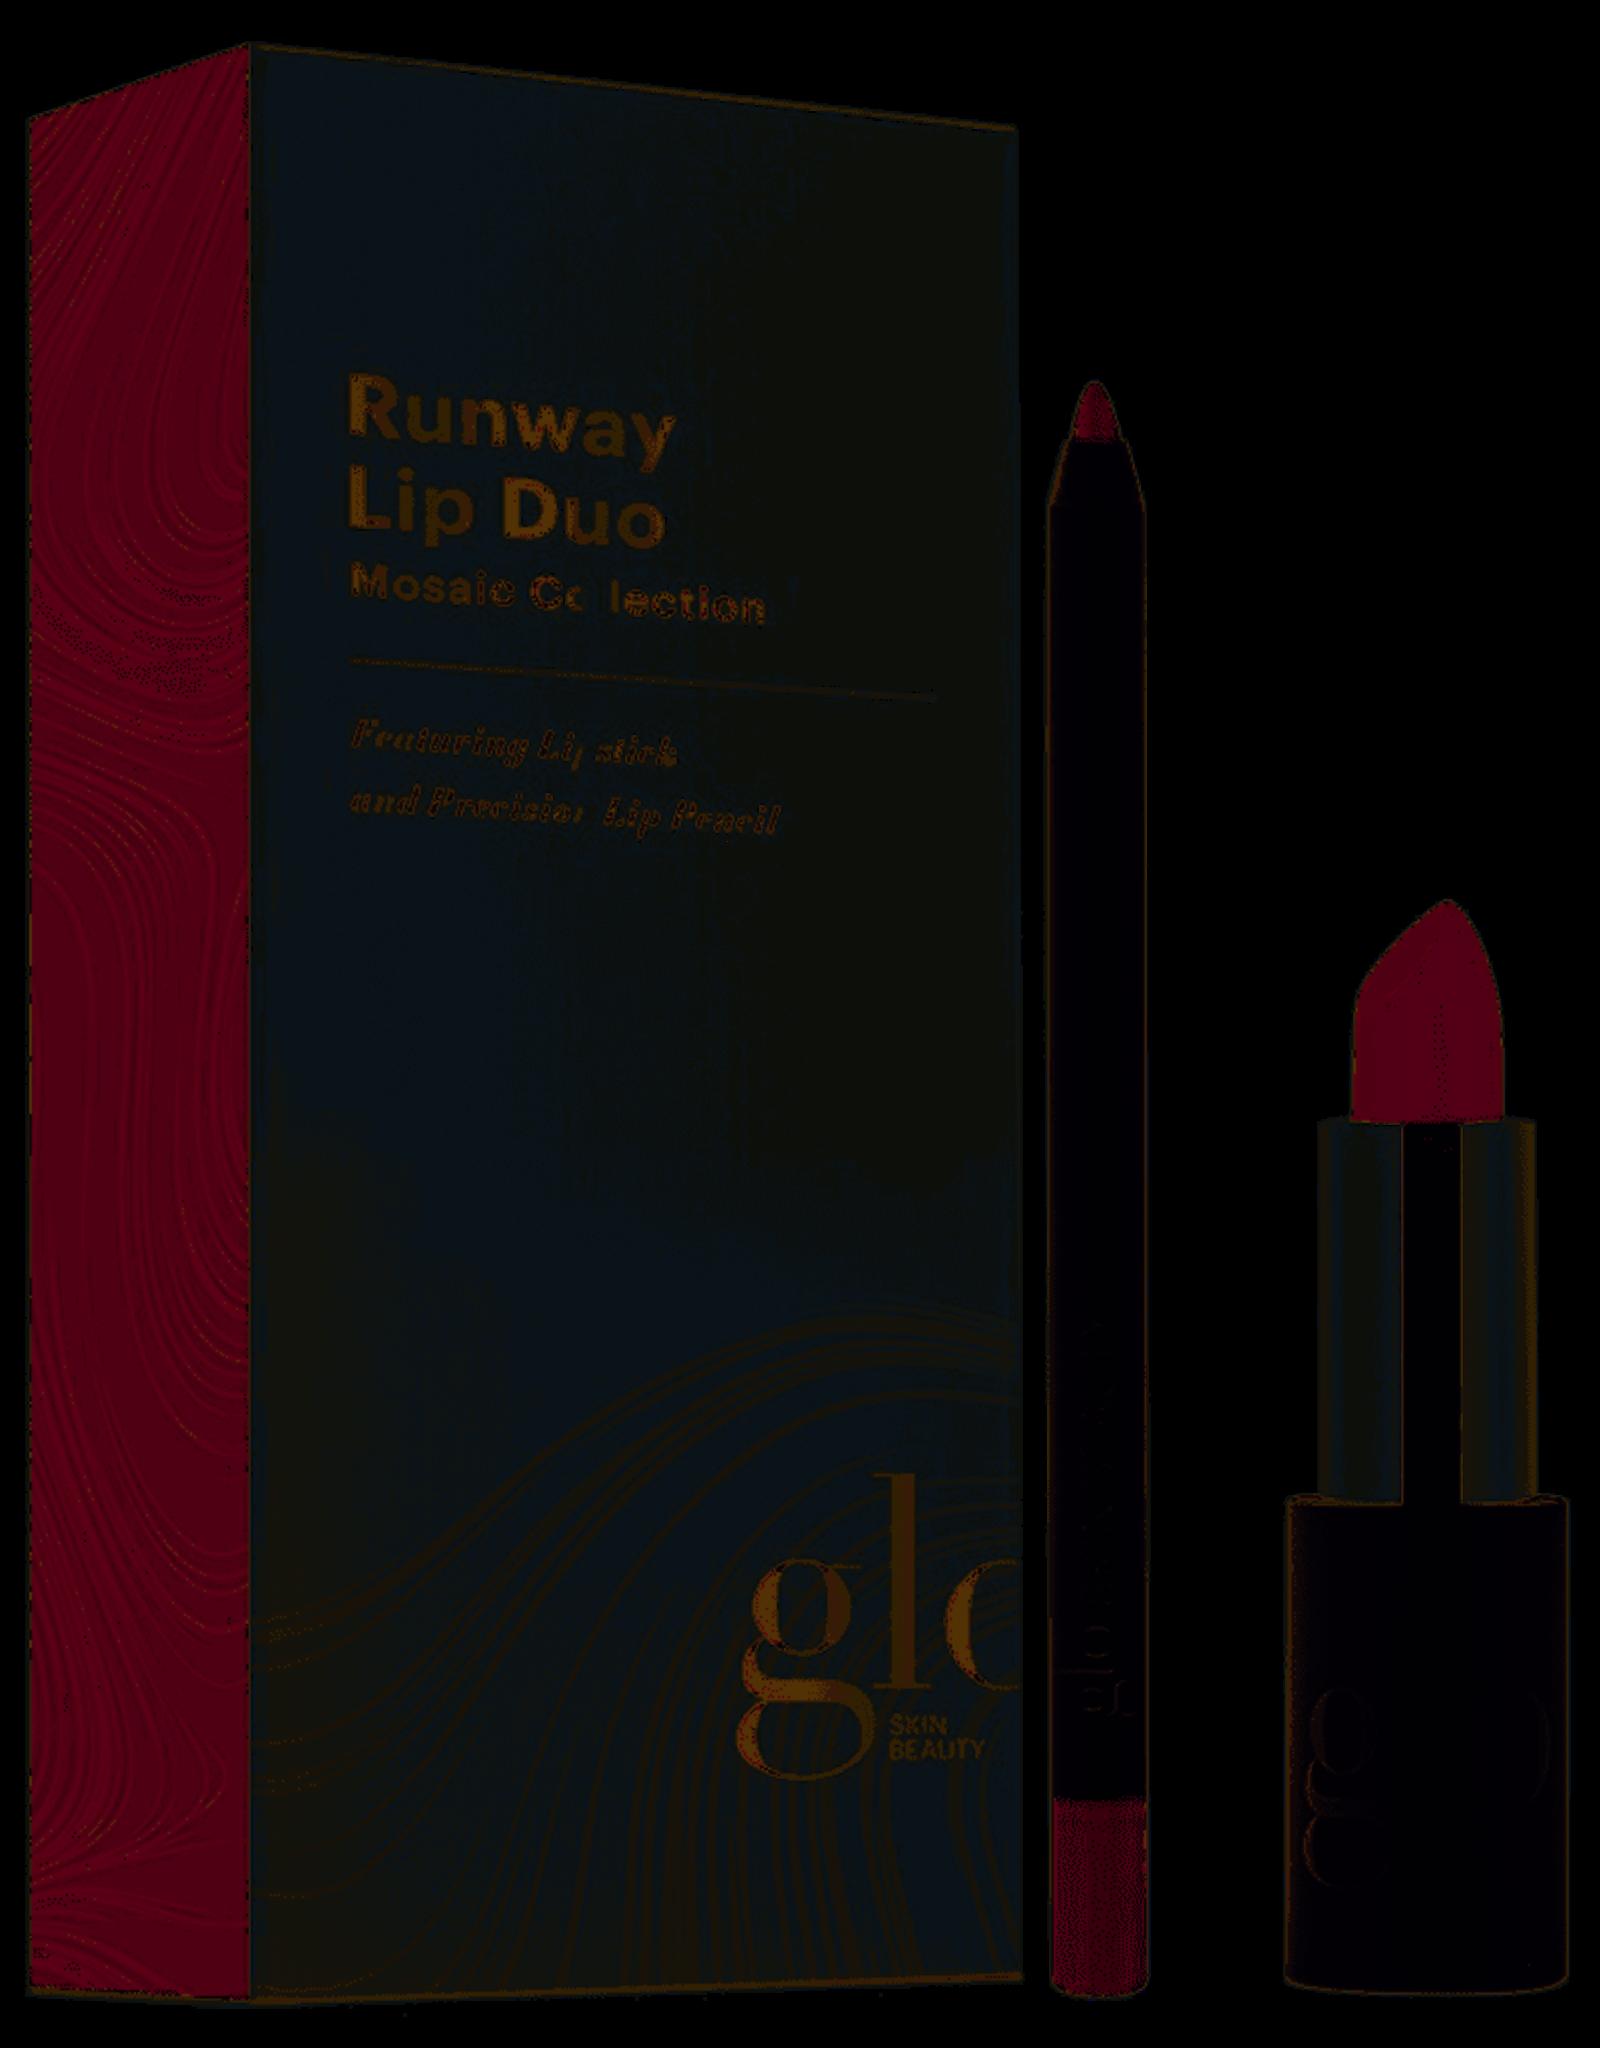 Glo Skin Beauty Runway Lip Duo